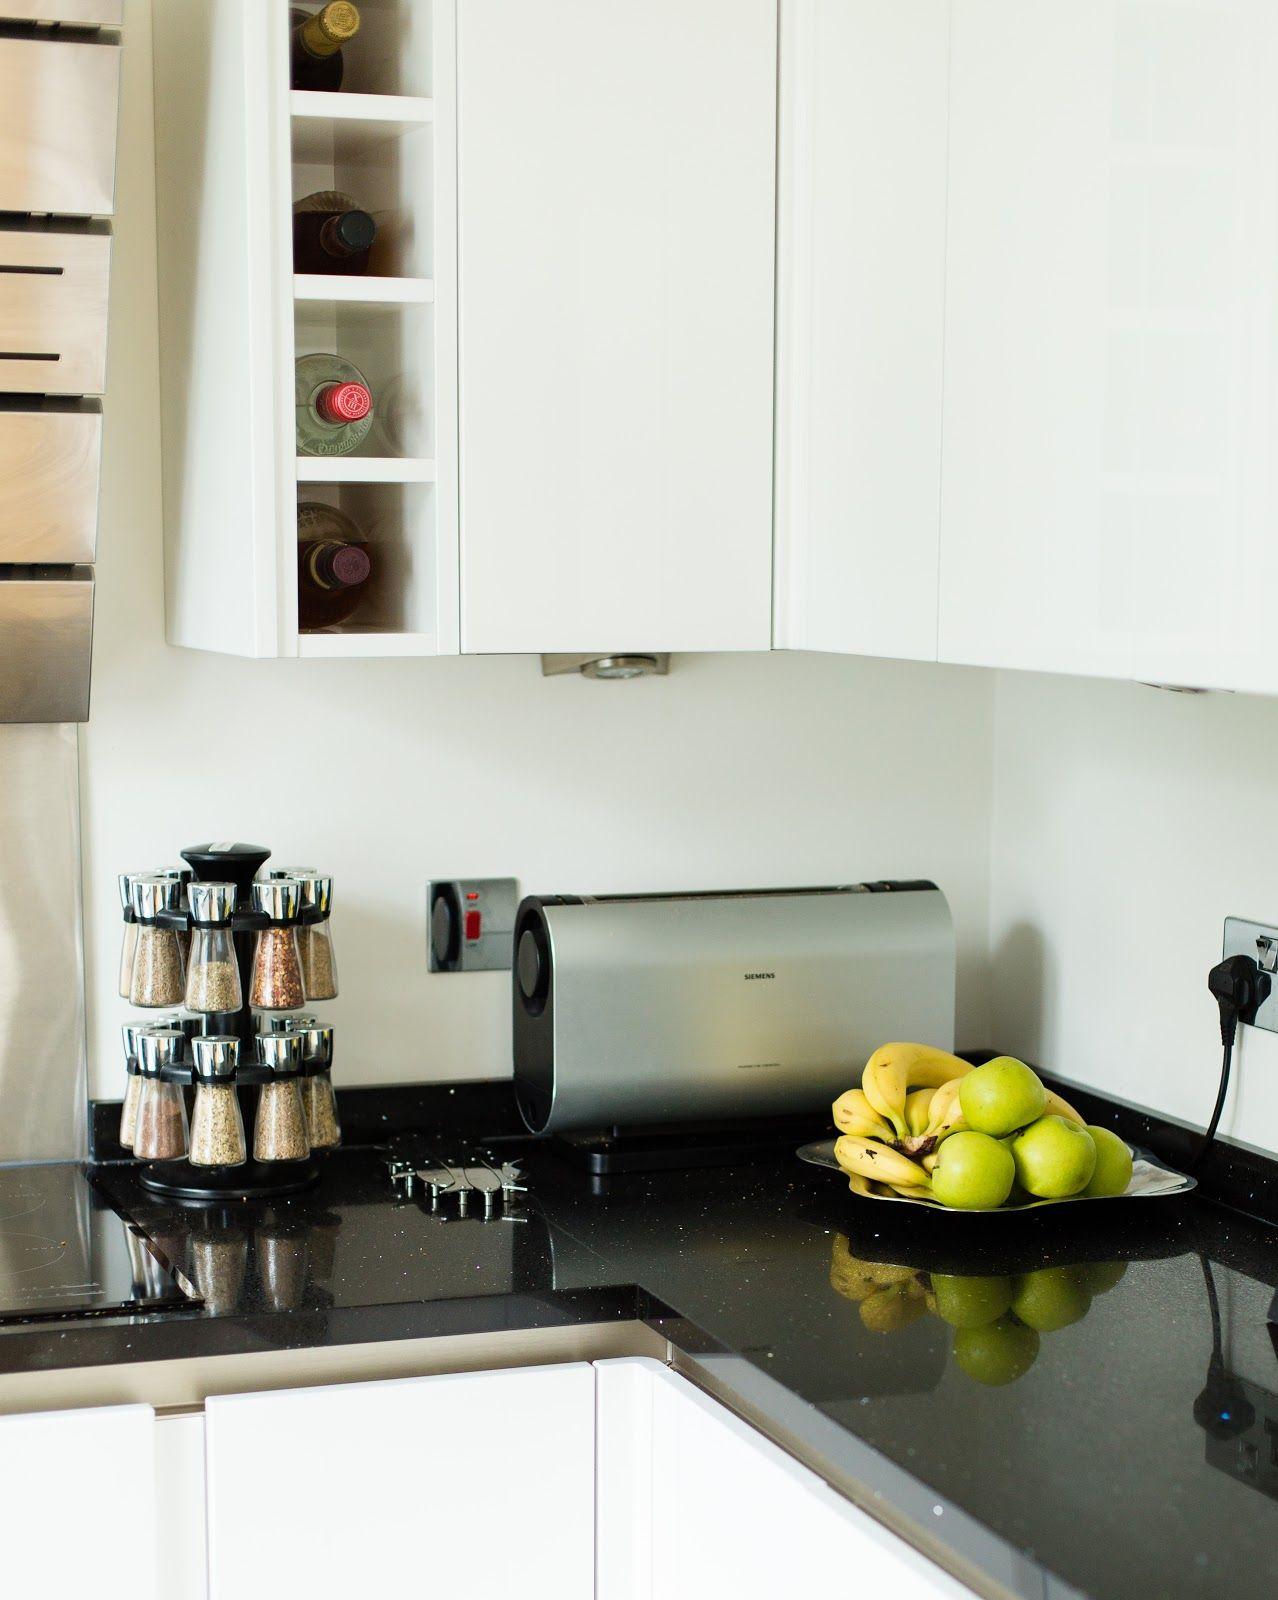 durable paint for kitchen cabinets en 2020 on best paint for kitchen cabinets diy id=32508